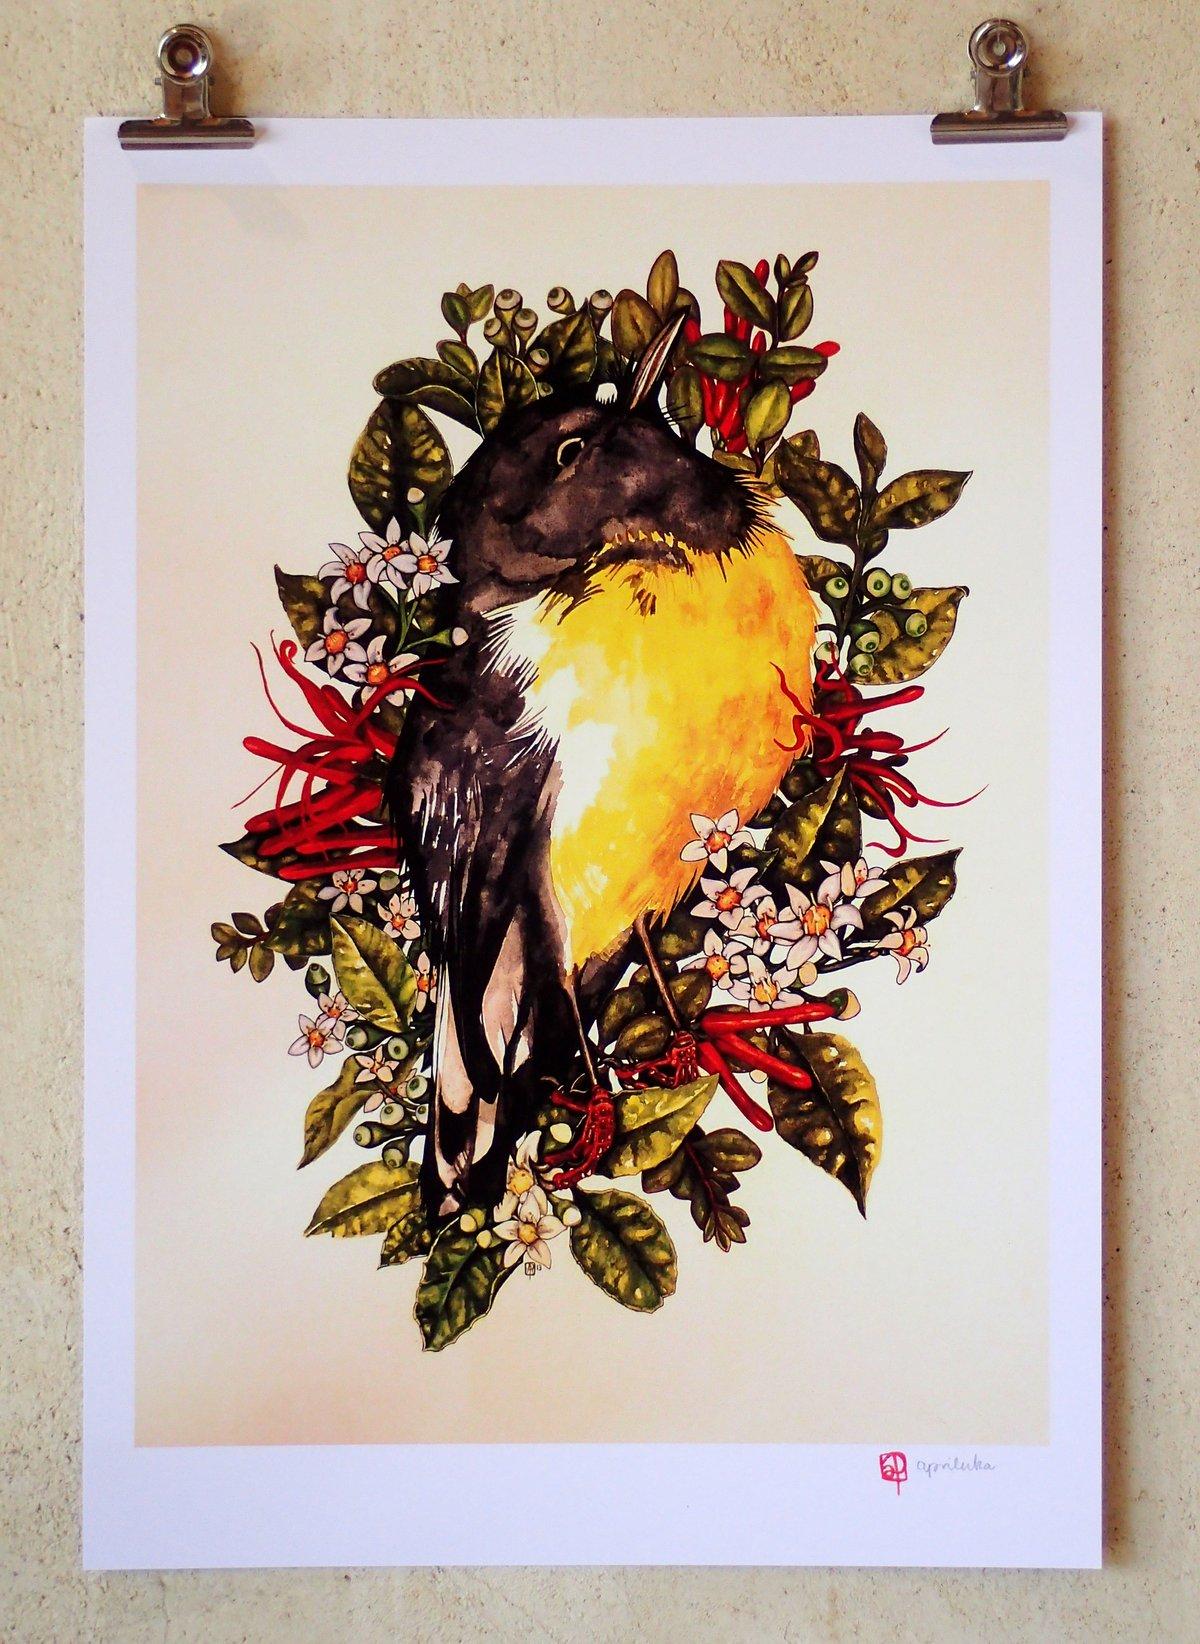 'Tomtit, Putaputaweta and Mistletoe' - A3 Print